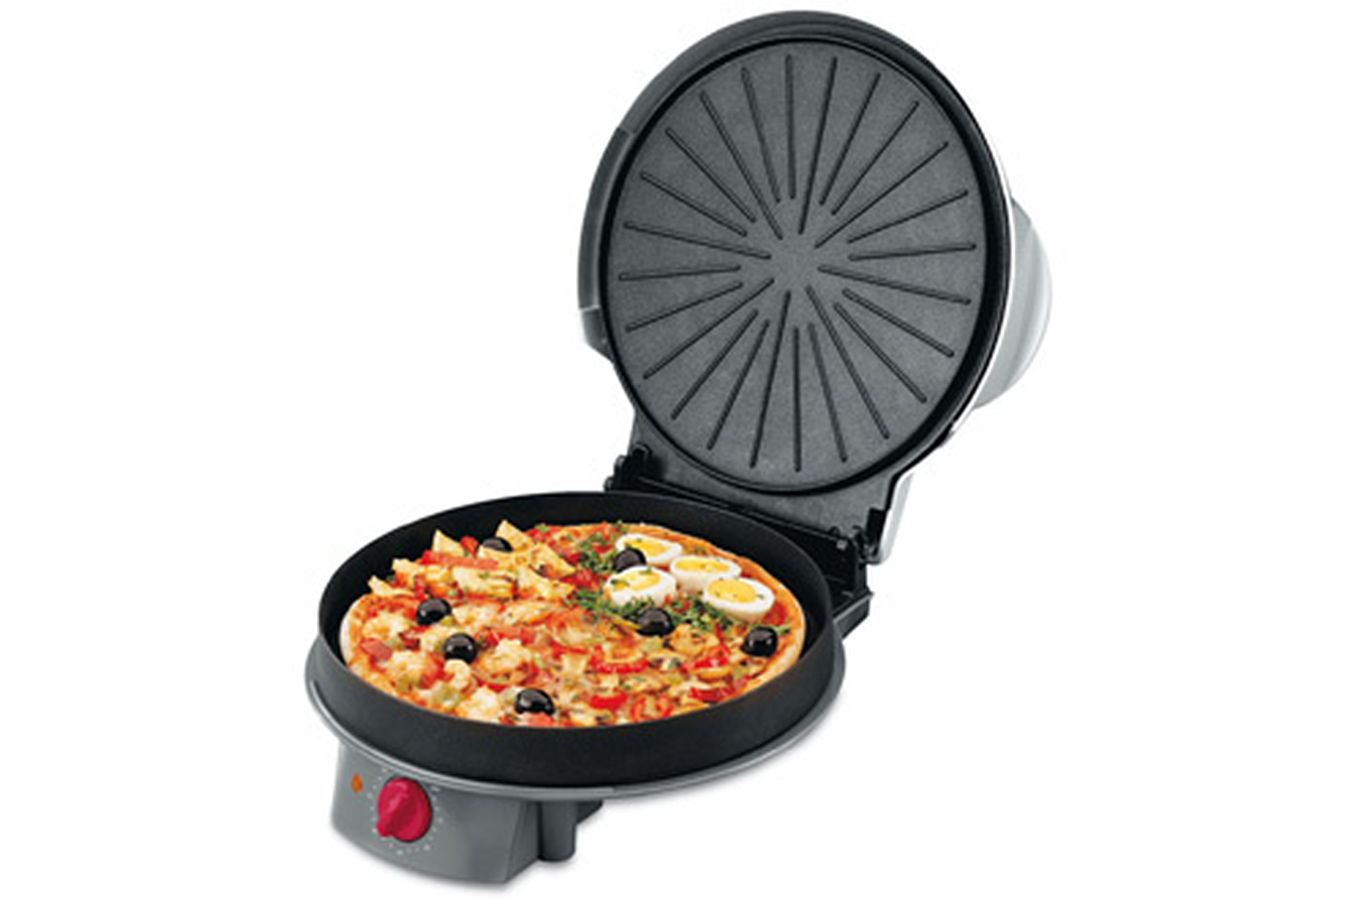 mini four four posable fagor mg 300 multigril pizza. Black Bedroom Furniture Sets. Home Design Ideas